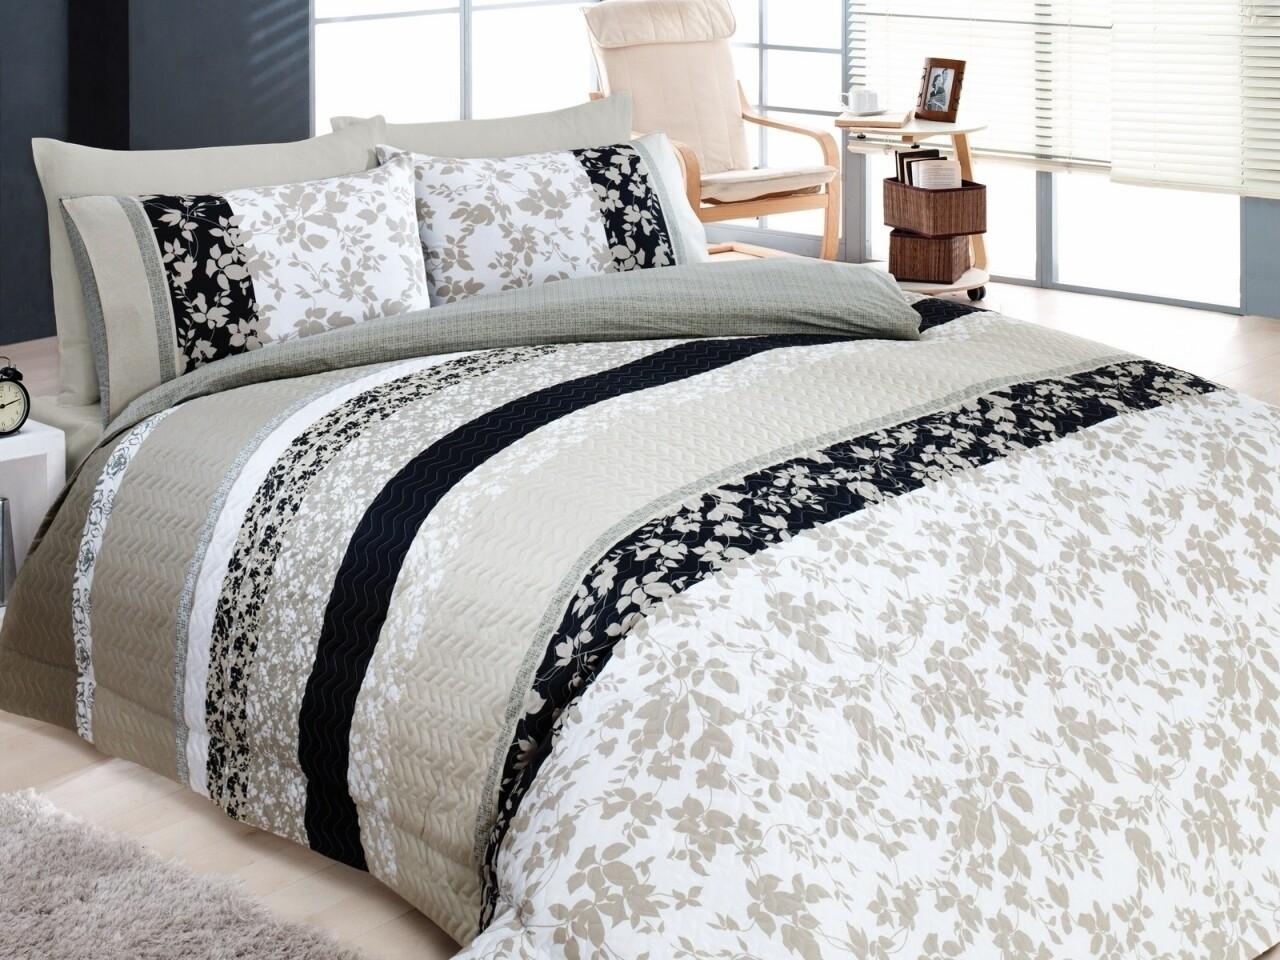 Lenjerie de pat matlasata pentru 2 persoane, 4 piese, 100% bumbac ranforce, Cotton Box, Deborah